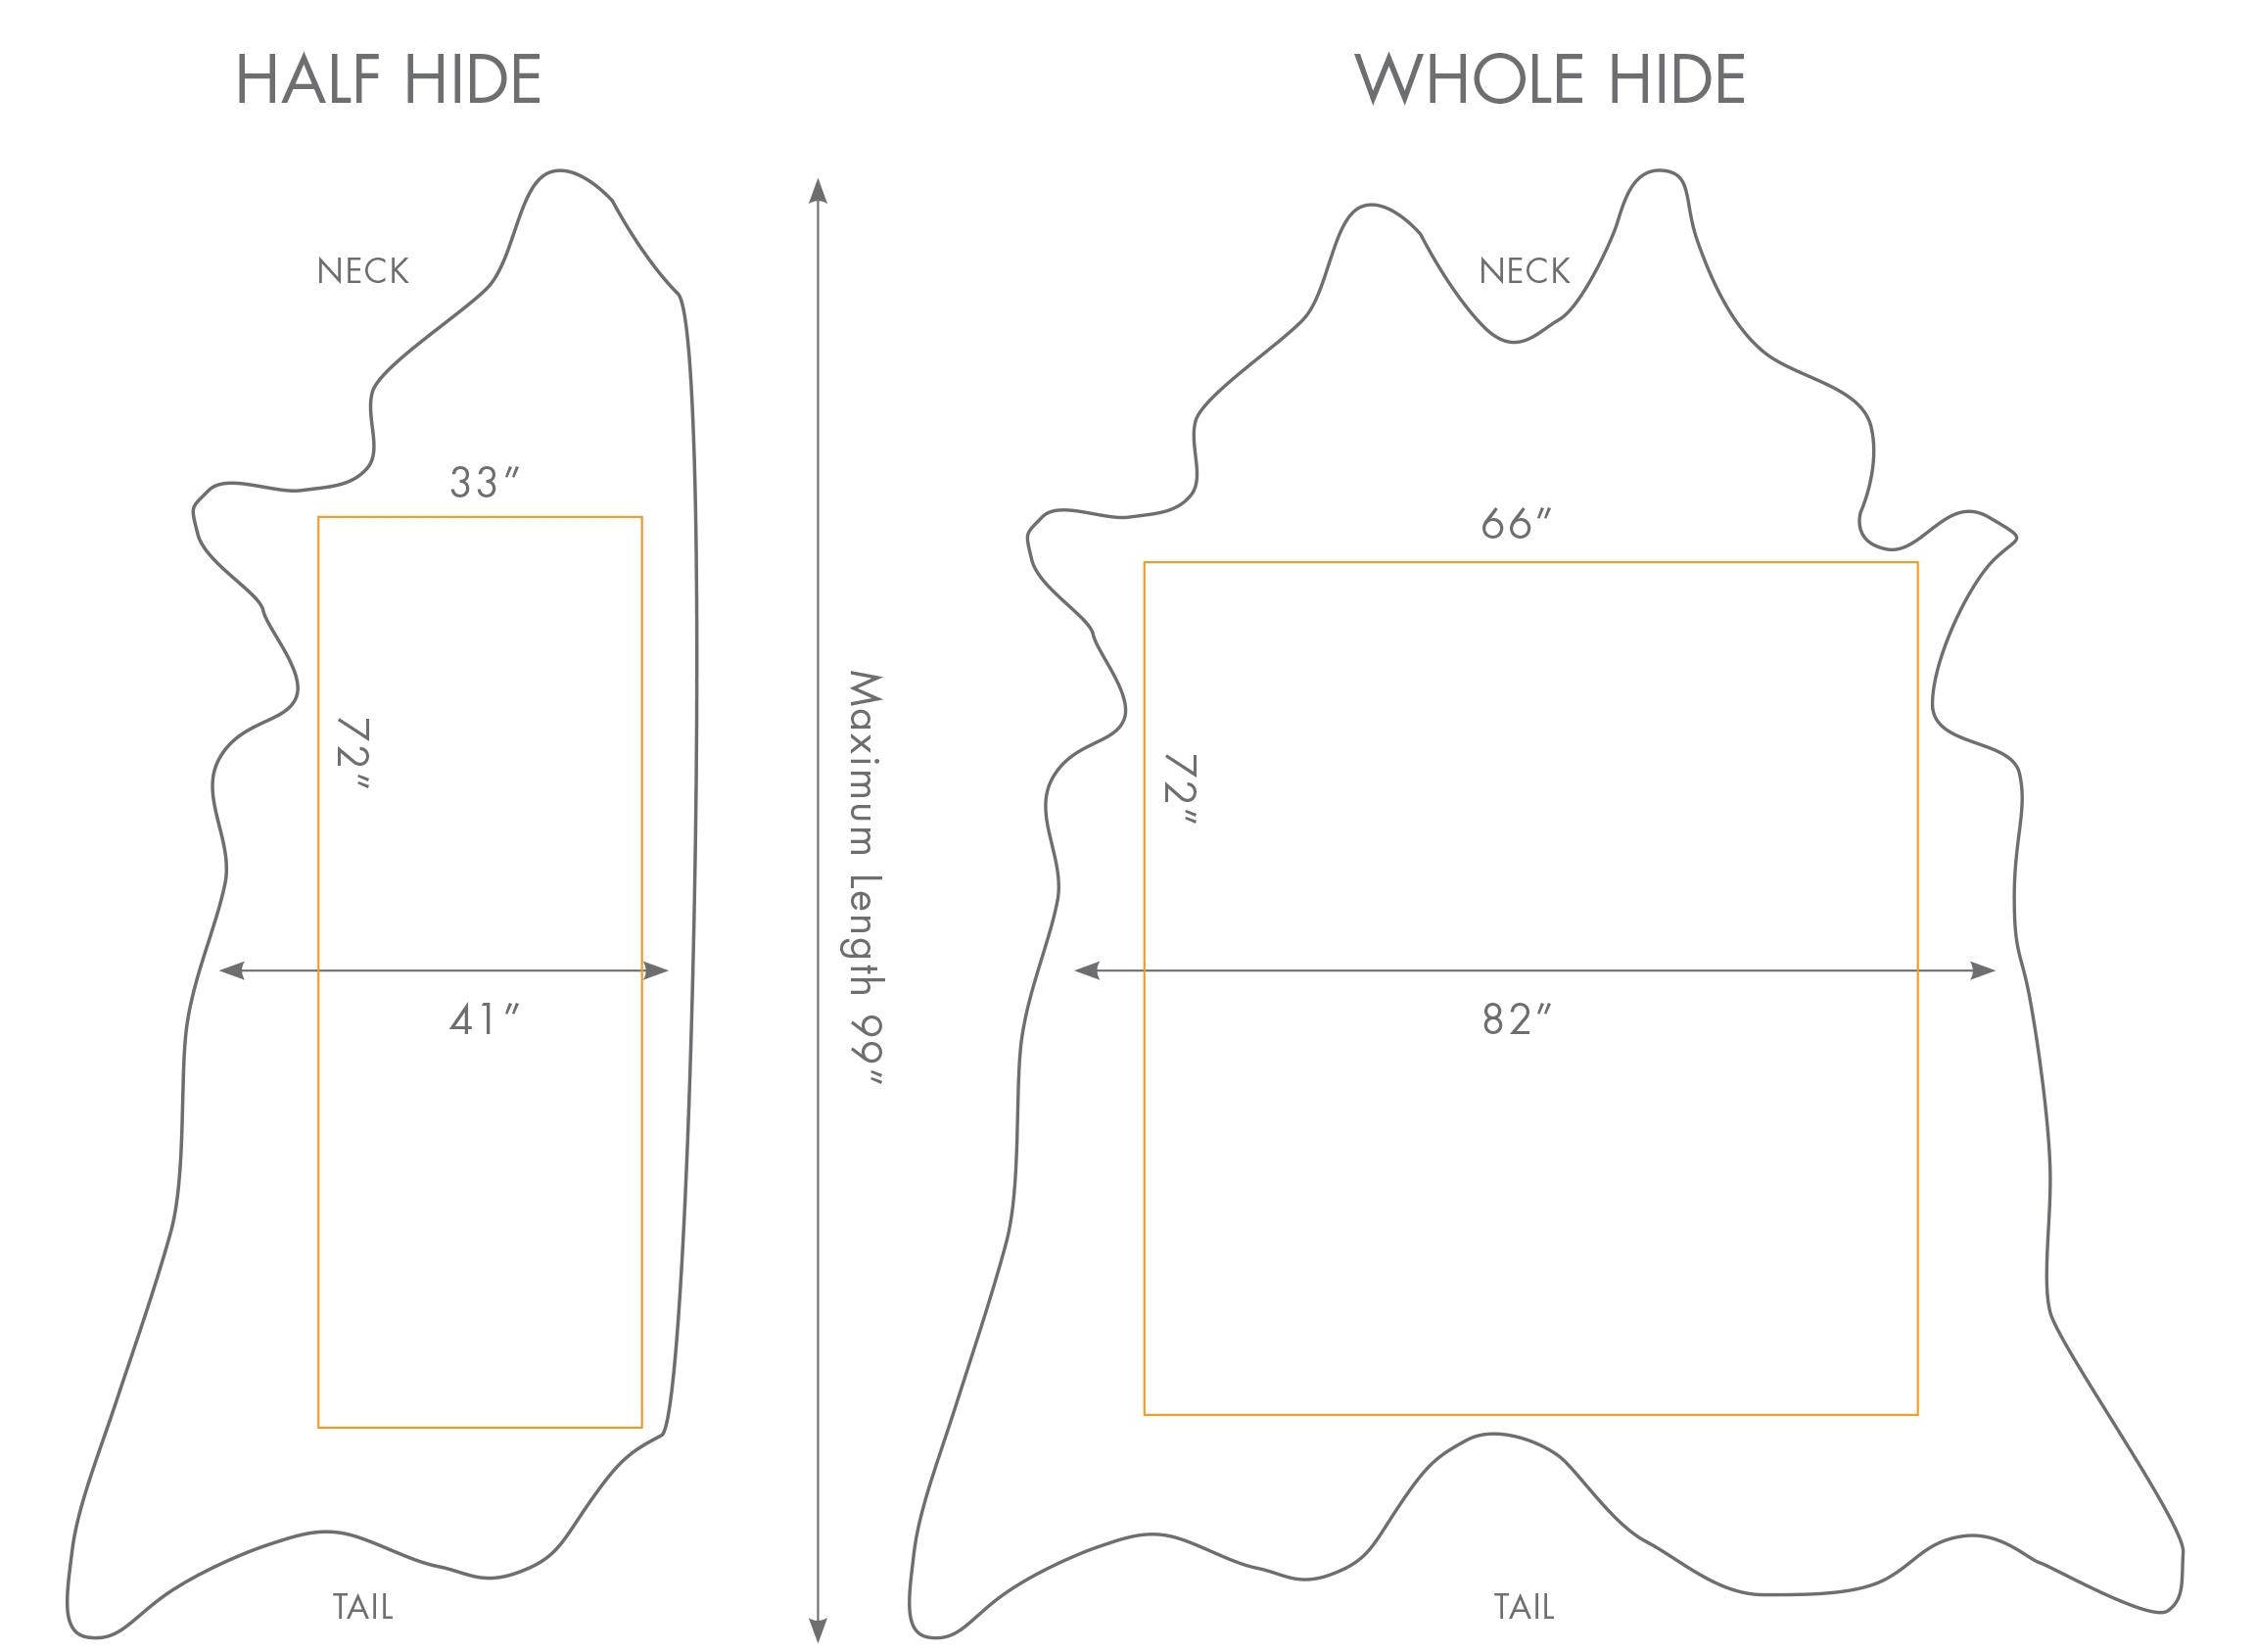 average hide size